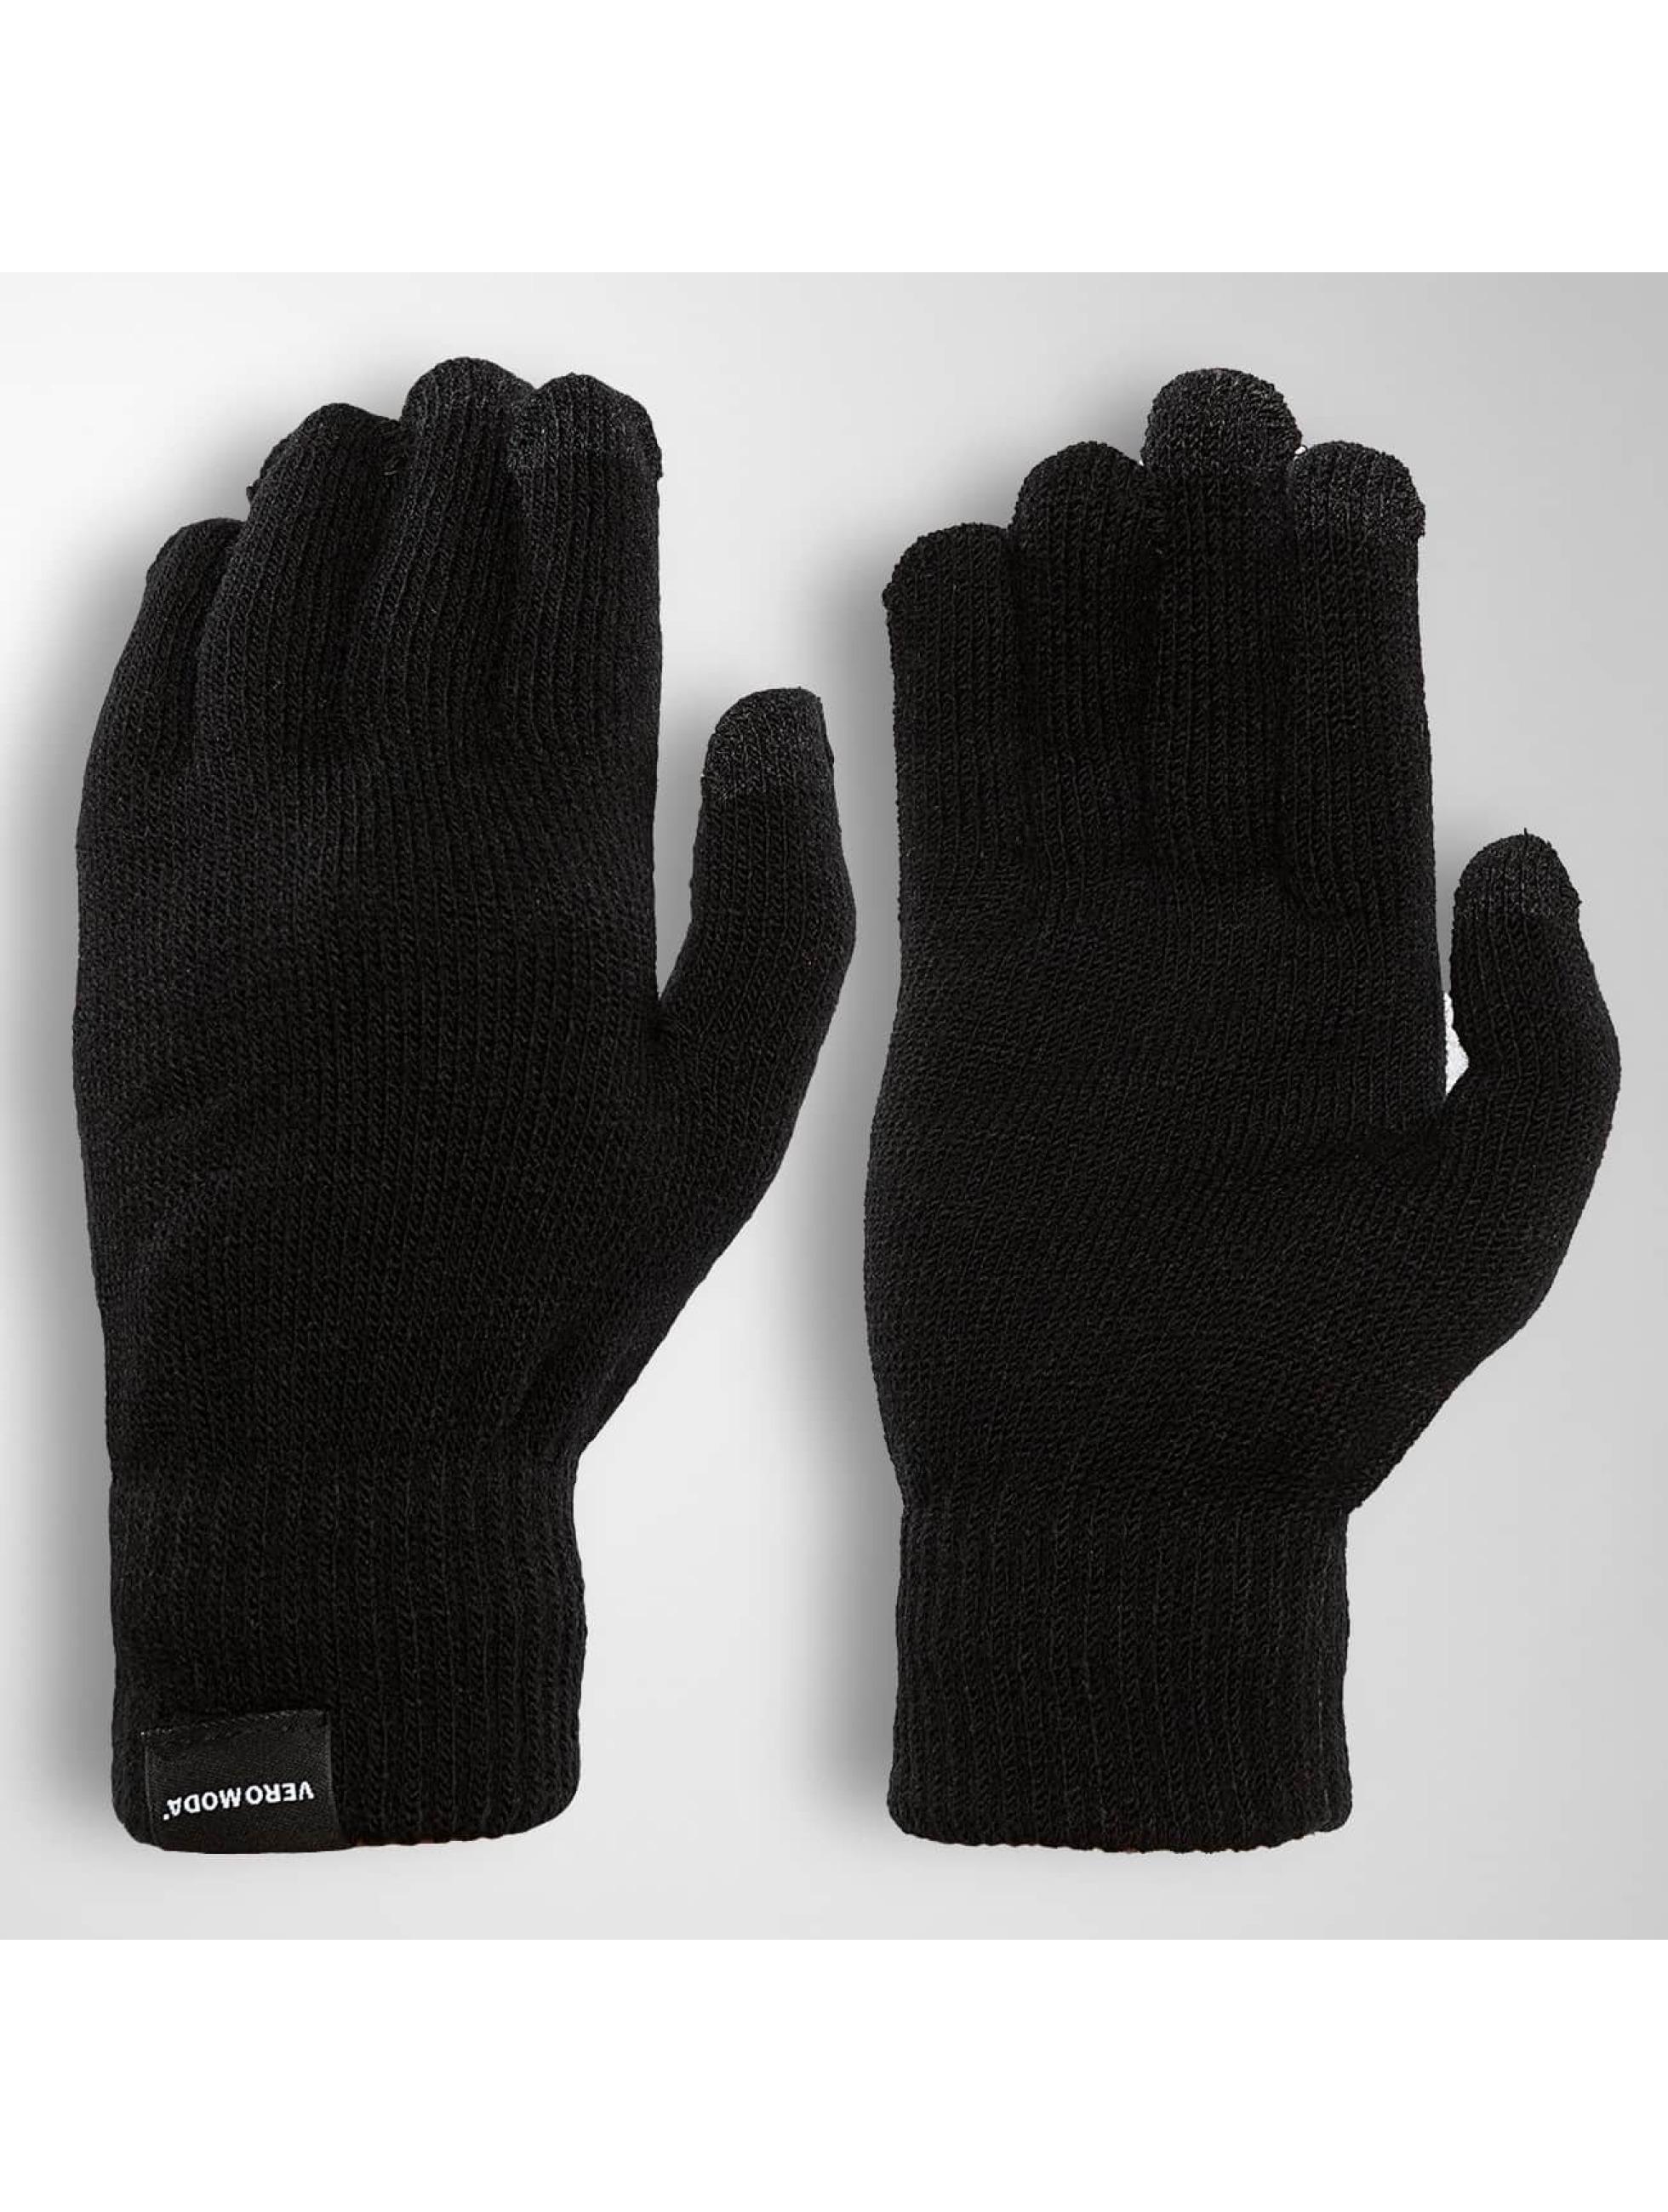 Vero Moda Frauen Handschuhe 10136390 in schwarz